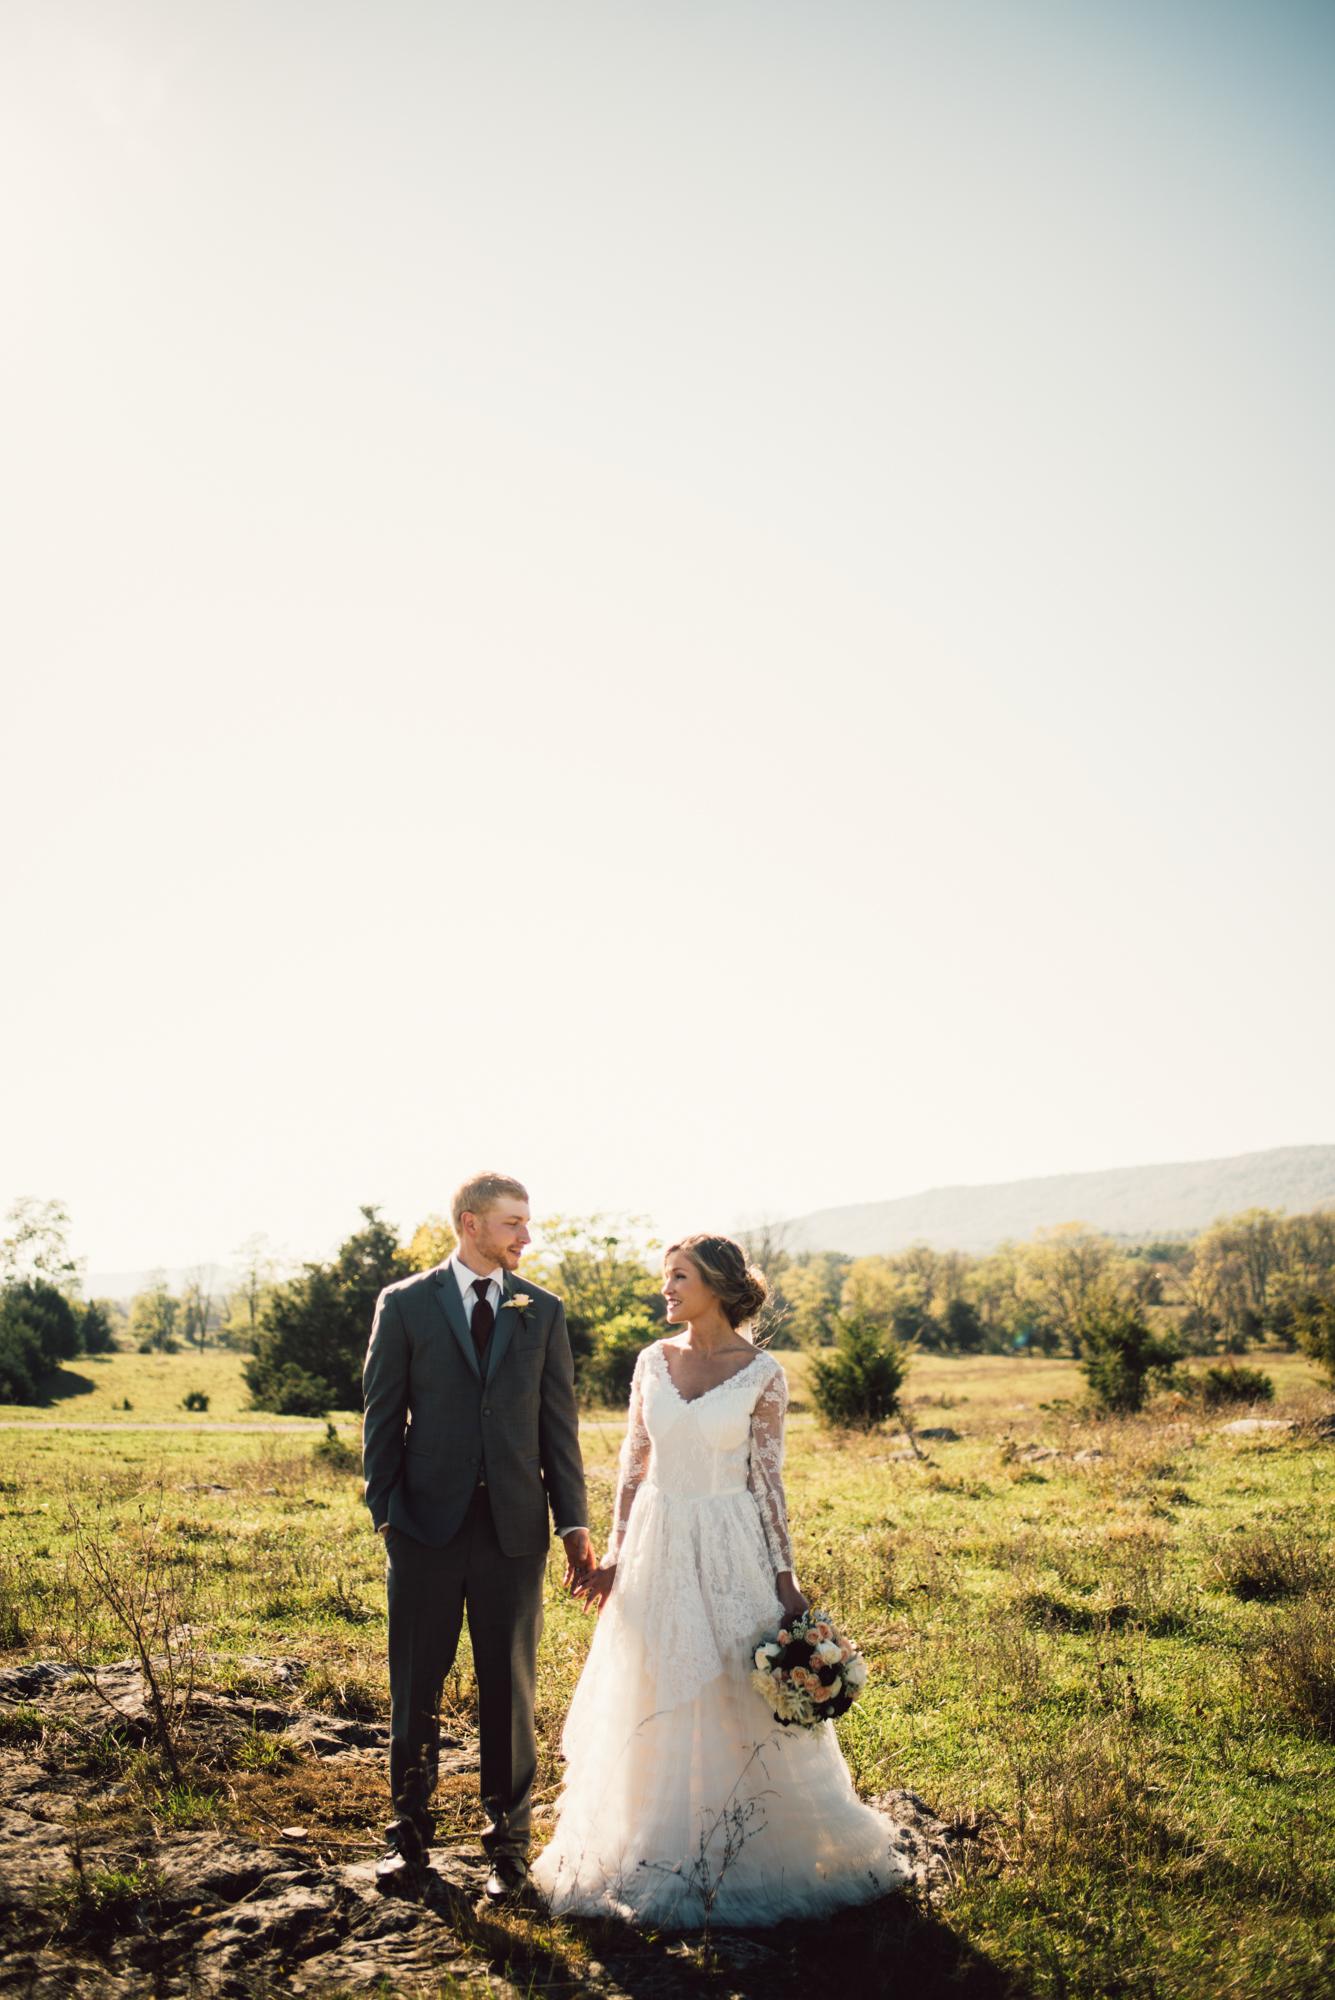 Ashley-and-Michael-Beaune-Woodstock-Virginia-Wedding-Shenandoah-Valley_25.JPG